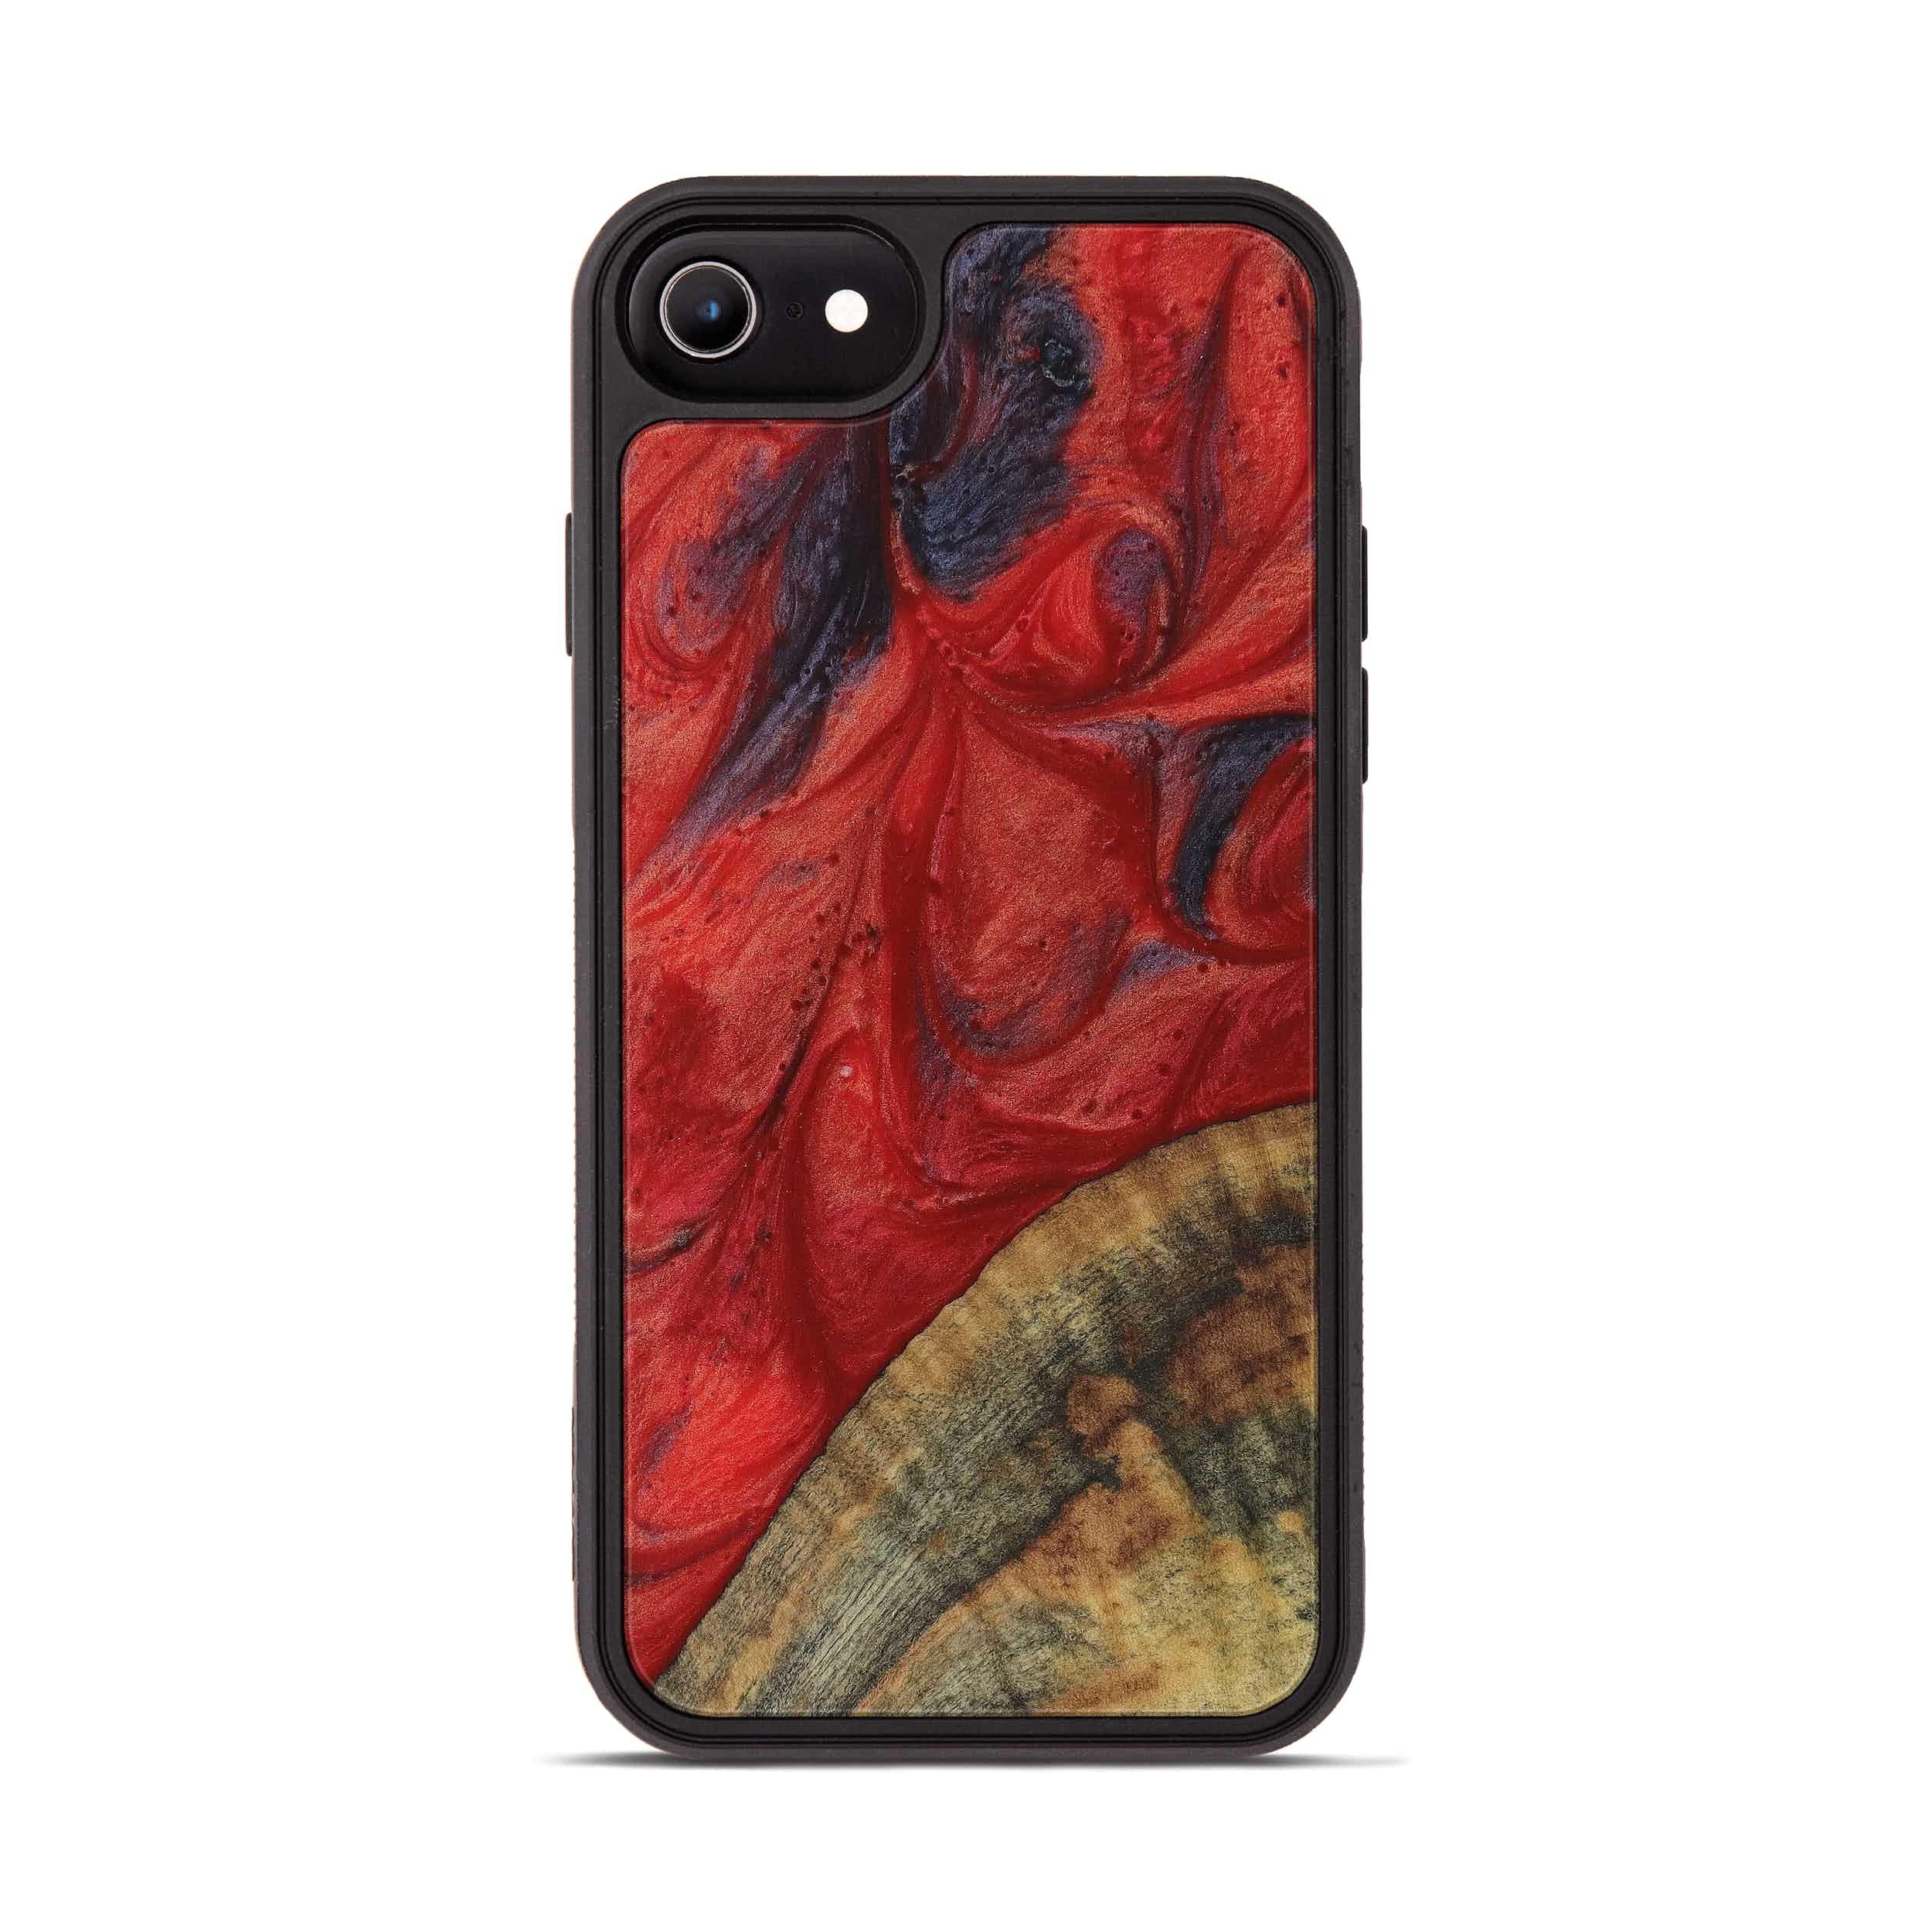 iPhone 6s Wood+Resin Phone Case - Naji (Dark Red, 395193)